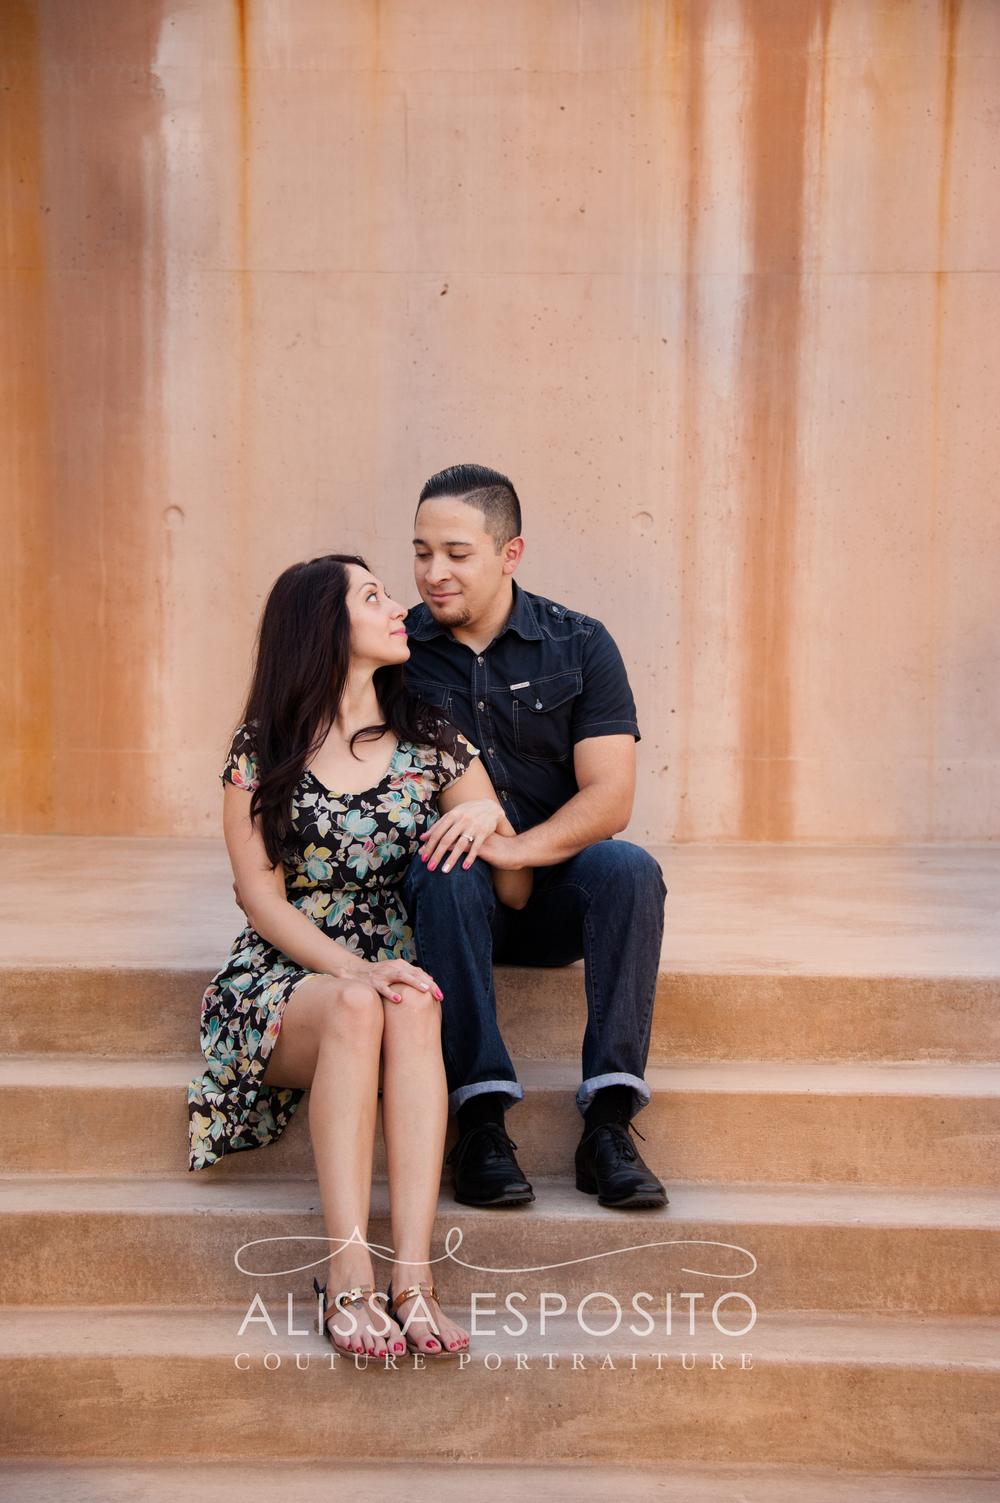 Las Vegas Wedding Photographer Alissa Esposito